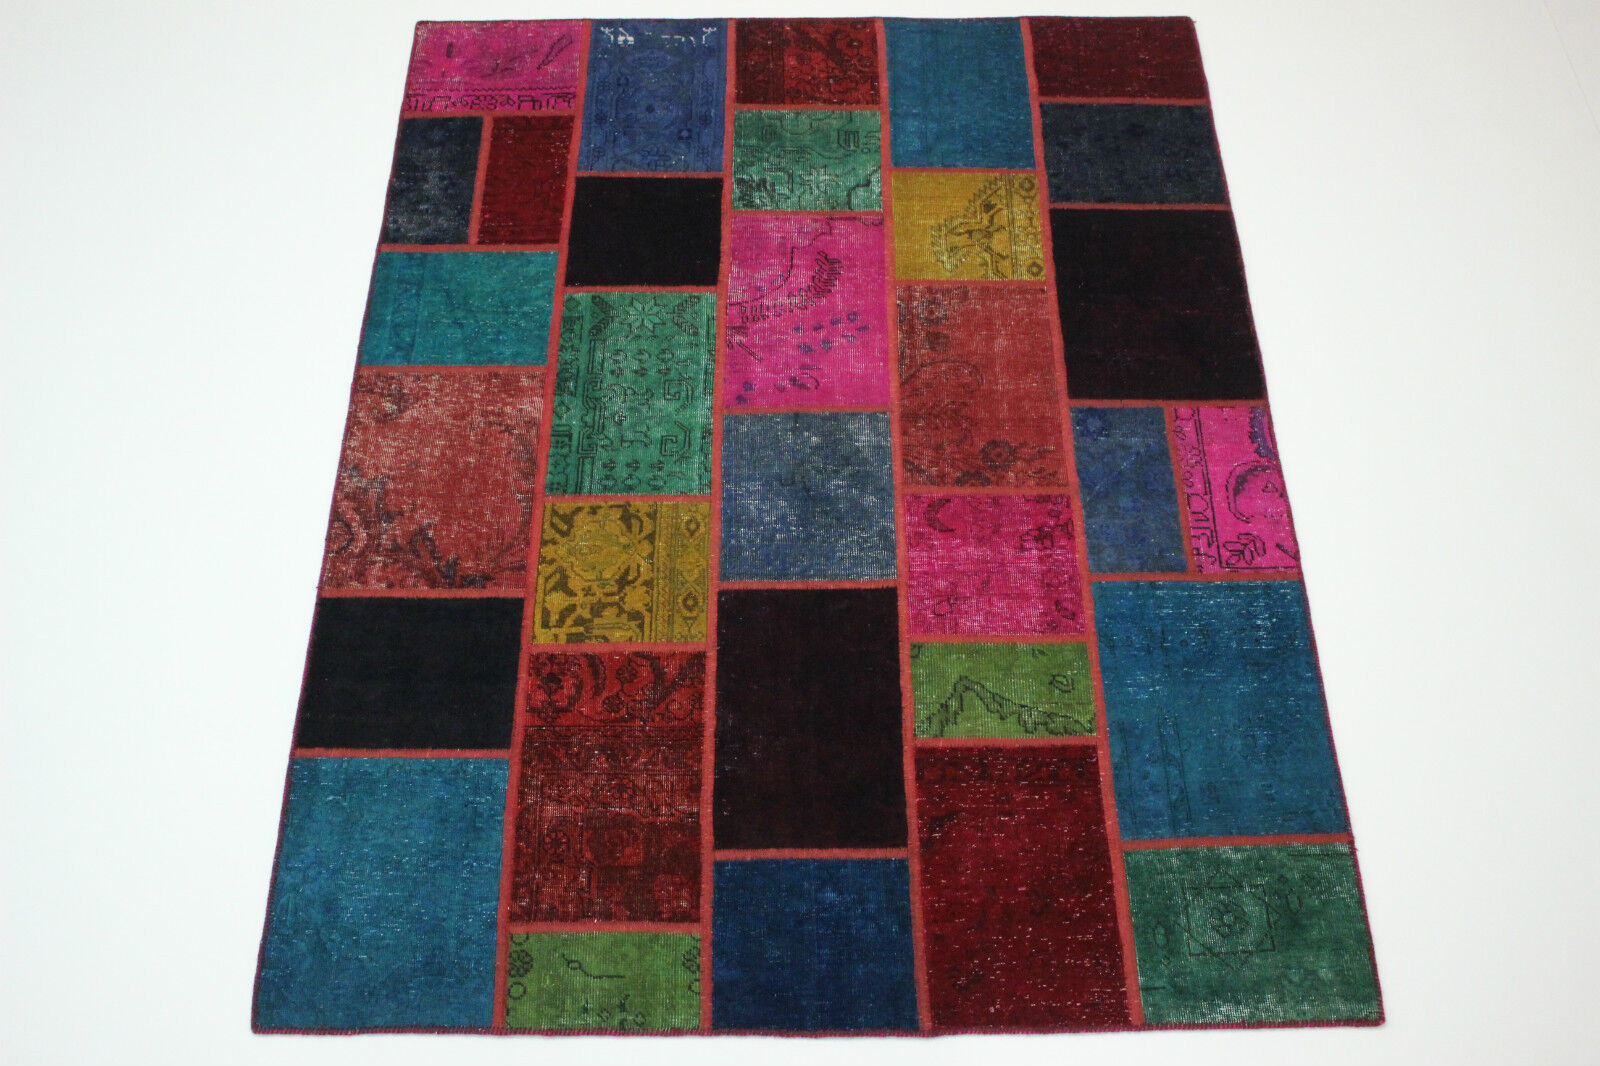 Modern patchwork Stone Wash look usado persas alfombra Orient alfombra de 2,38 x 1,74